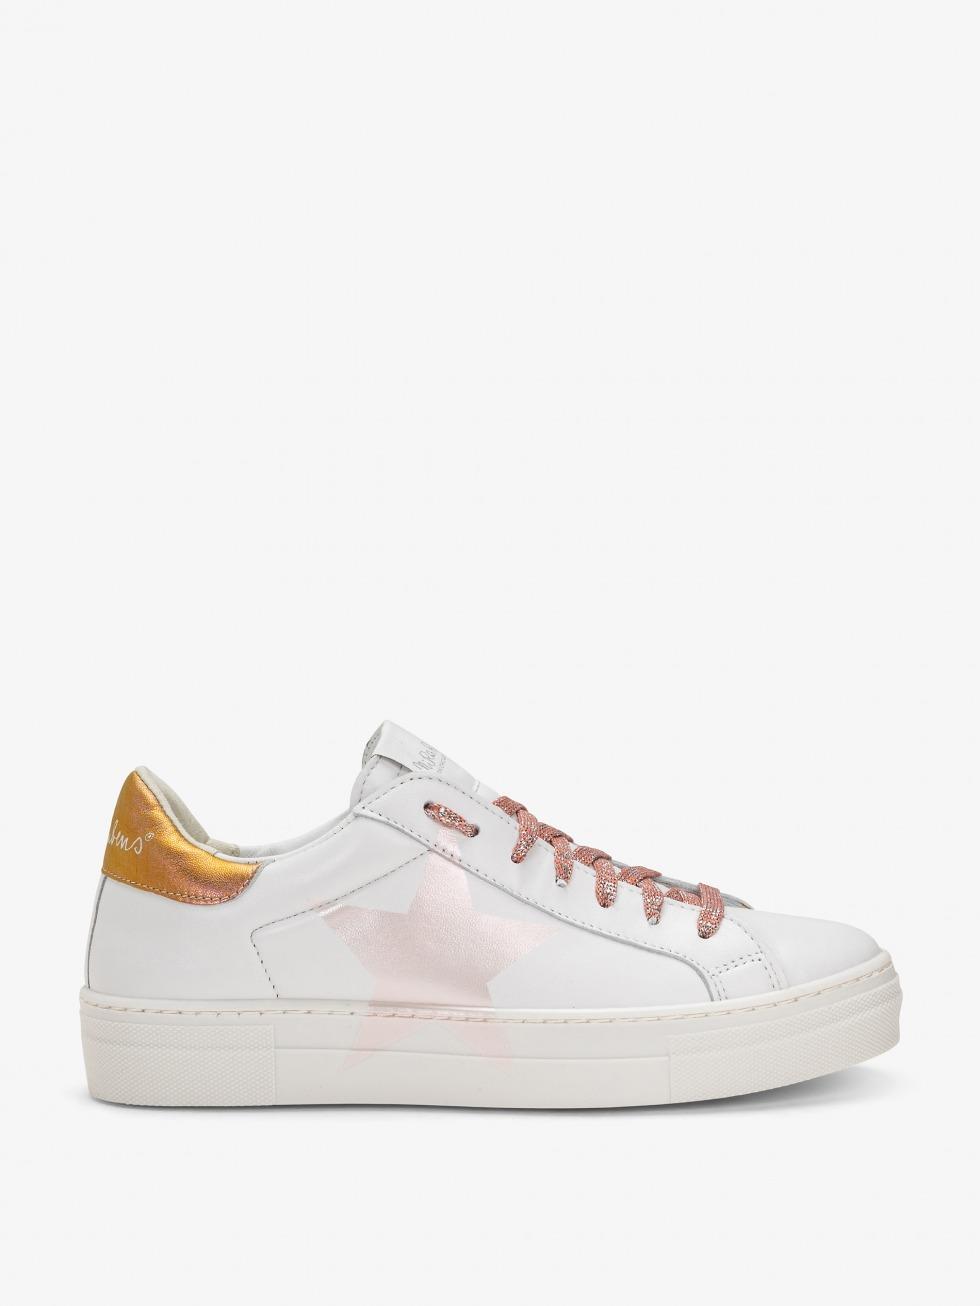 Martini Maracana Sneakers - Star